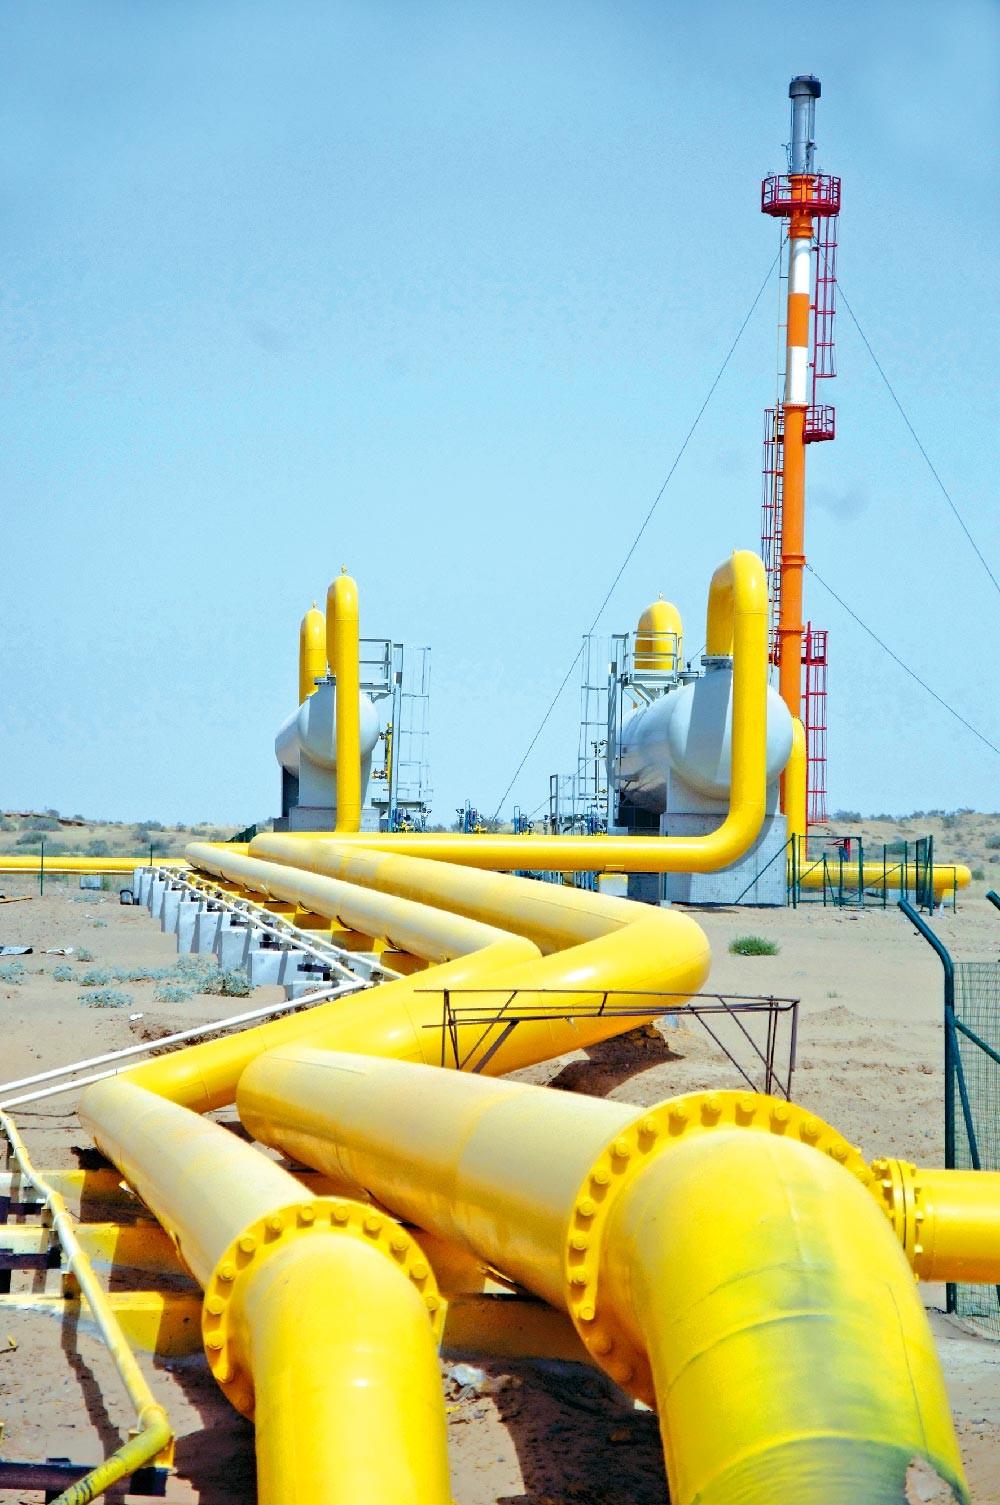 https://www.oilgas.gov.tm/storage/posts/2421/original-160d1ba2bb0d6c.jpeg